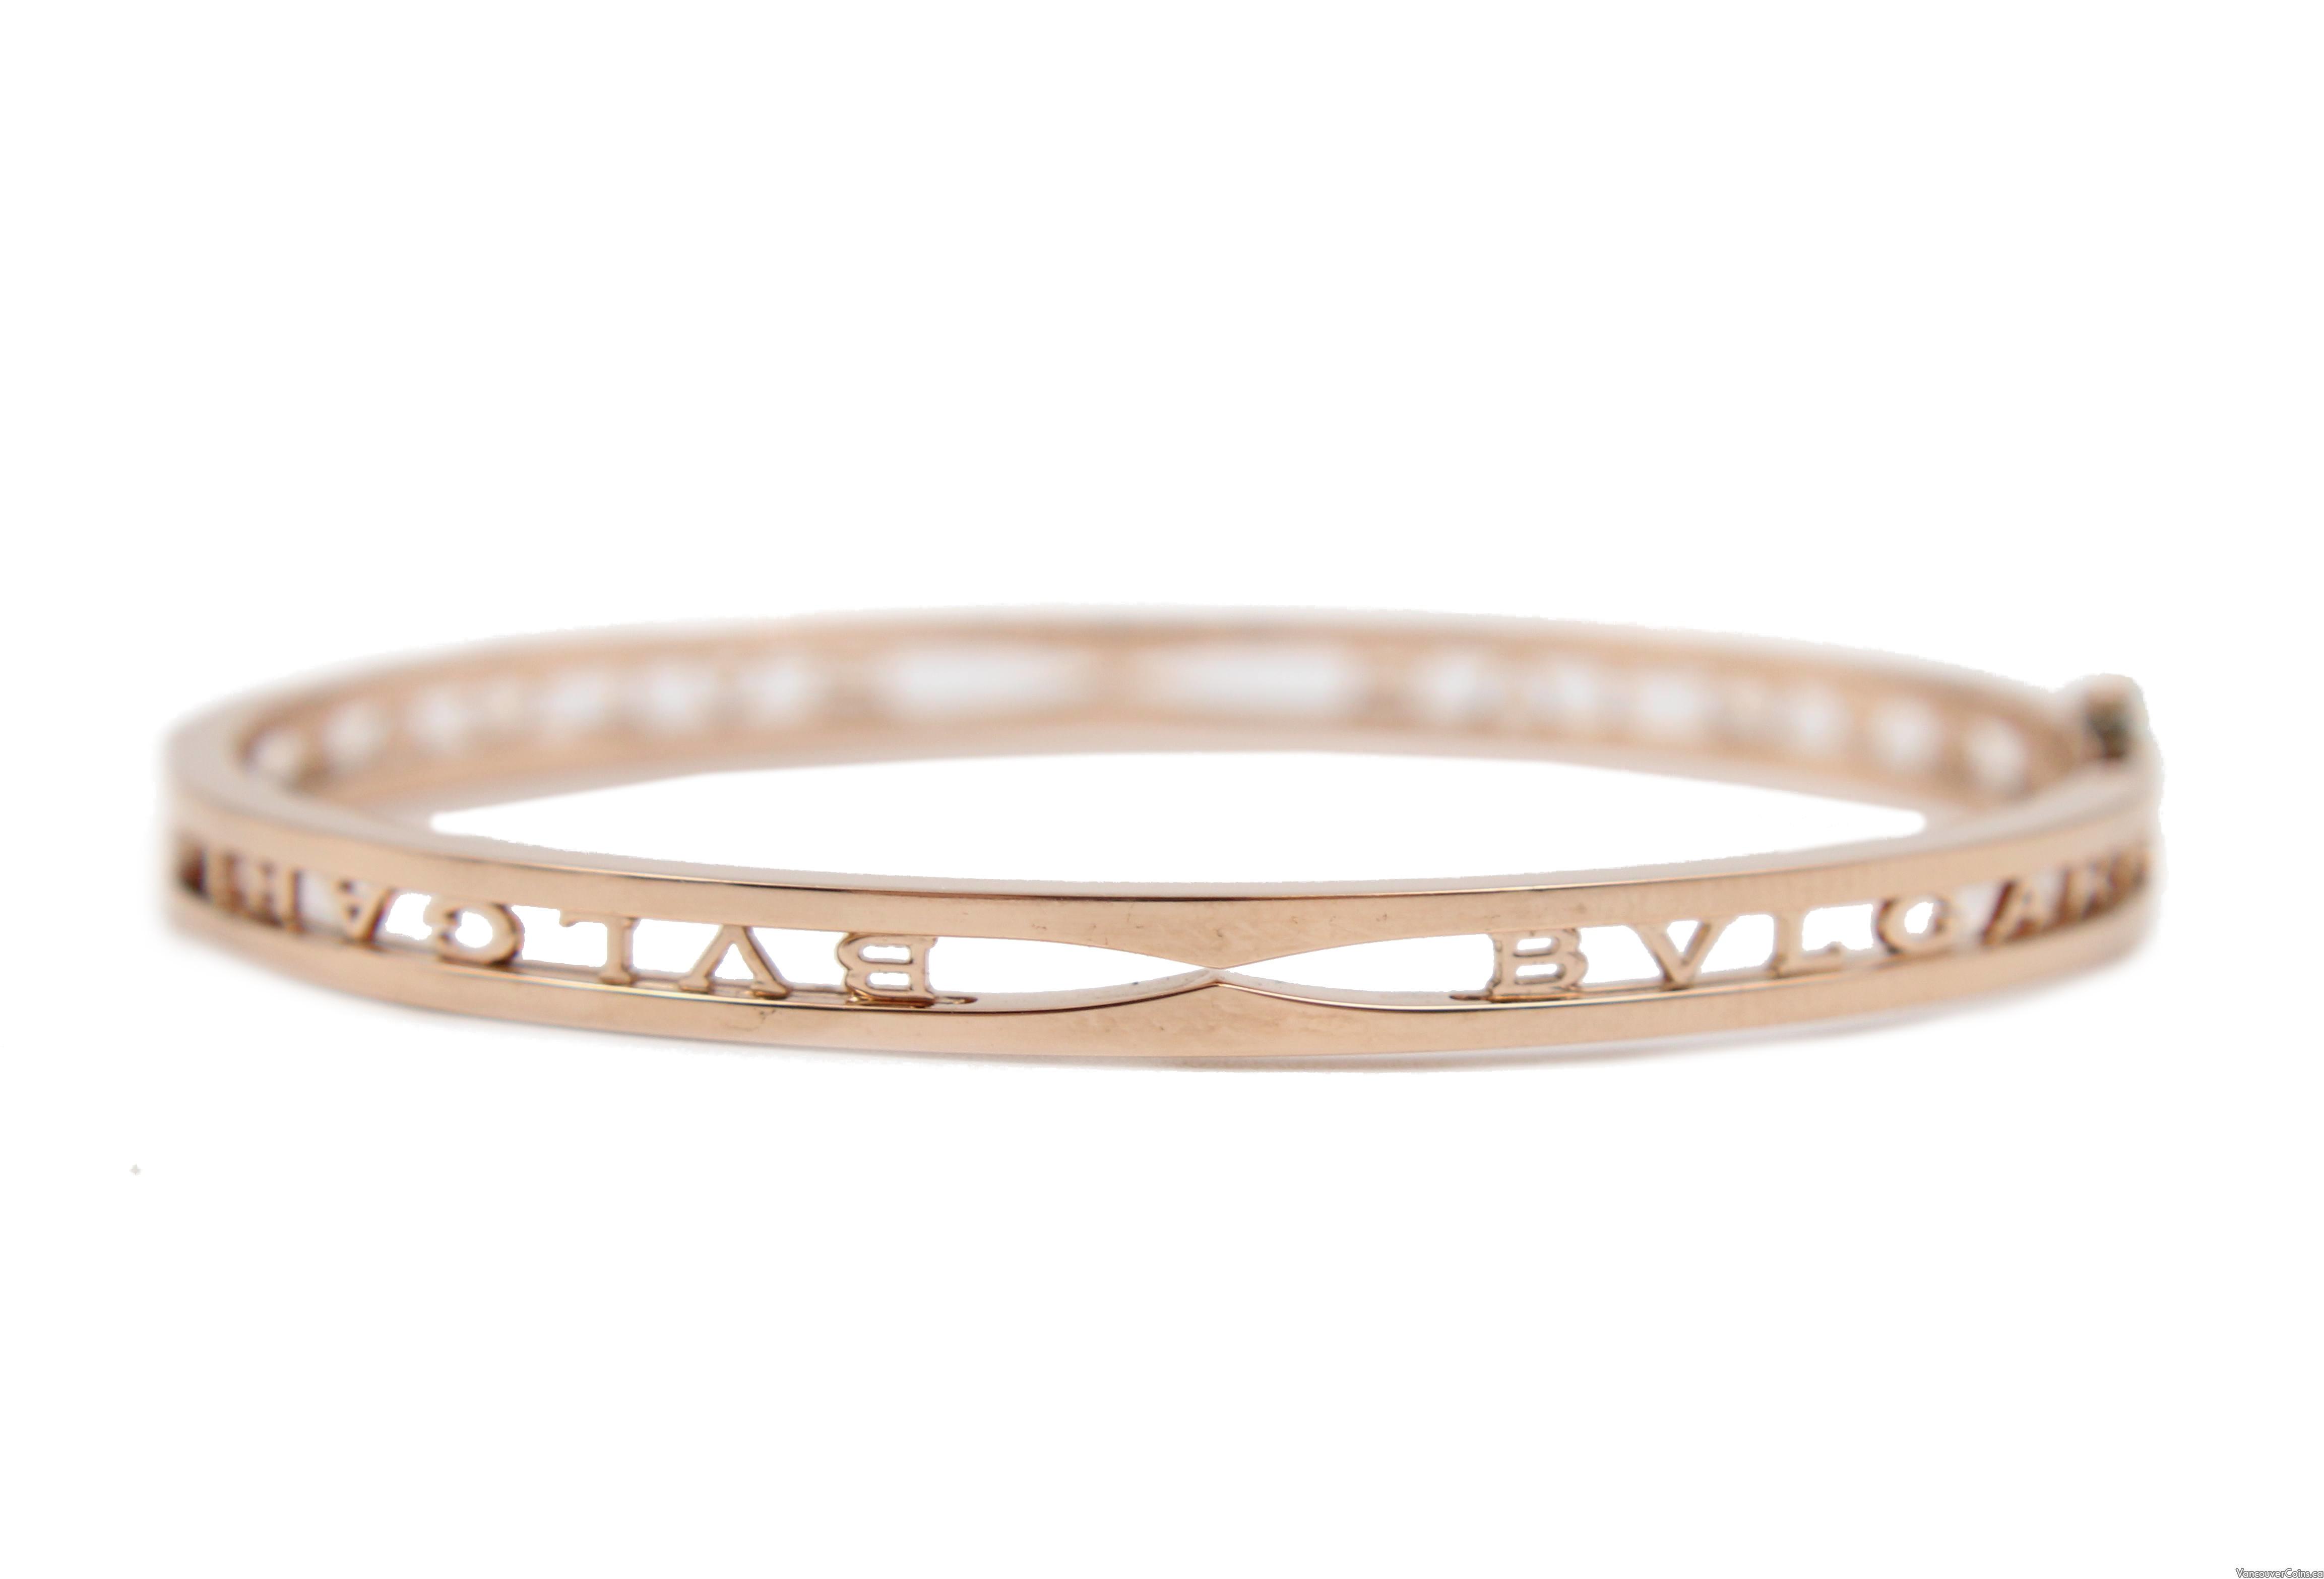 BVLGARI B.ZERO1 18K Rose Gold Bangle Bracelet